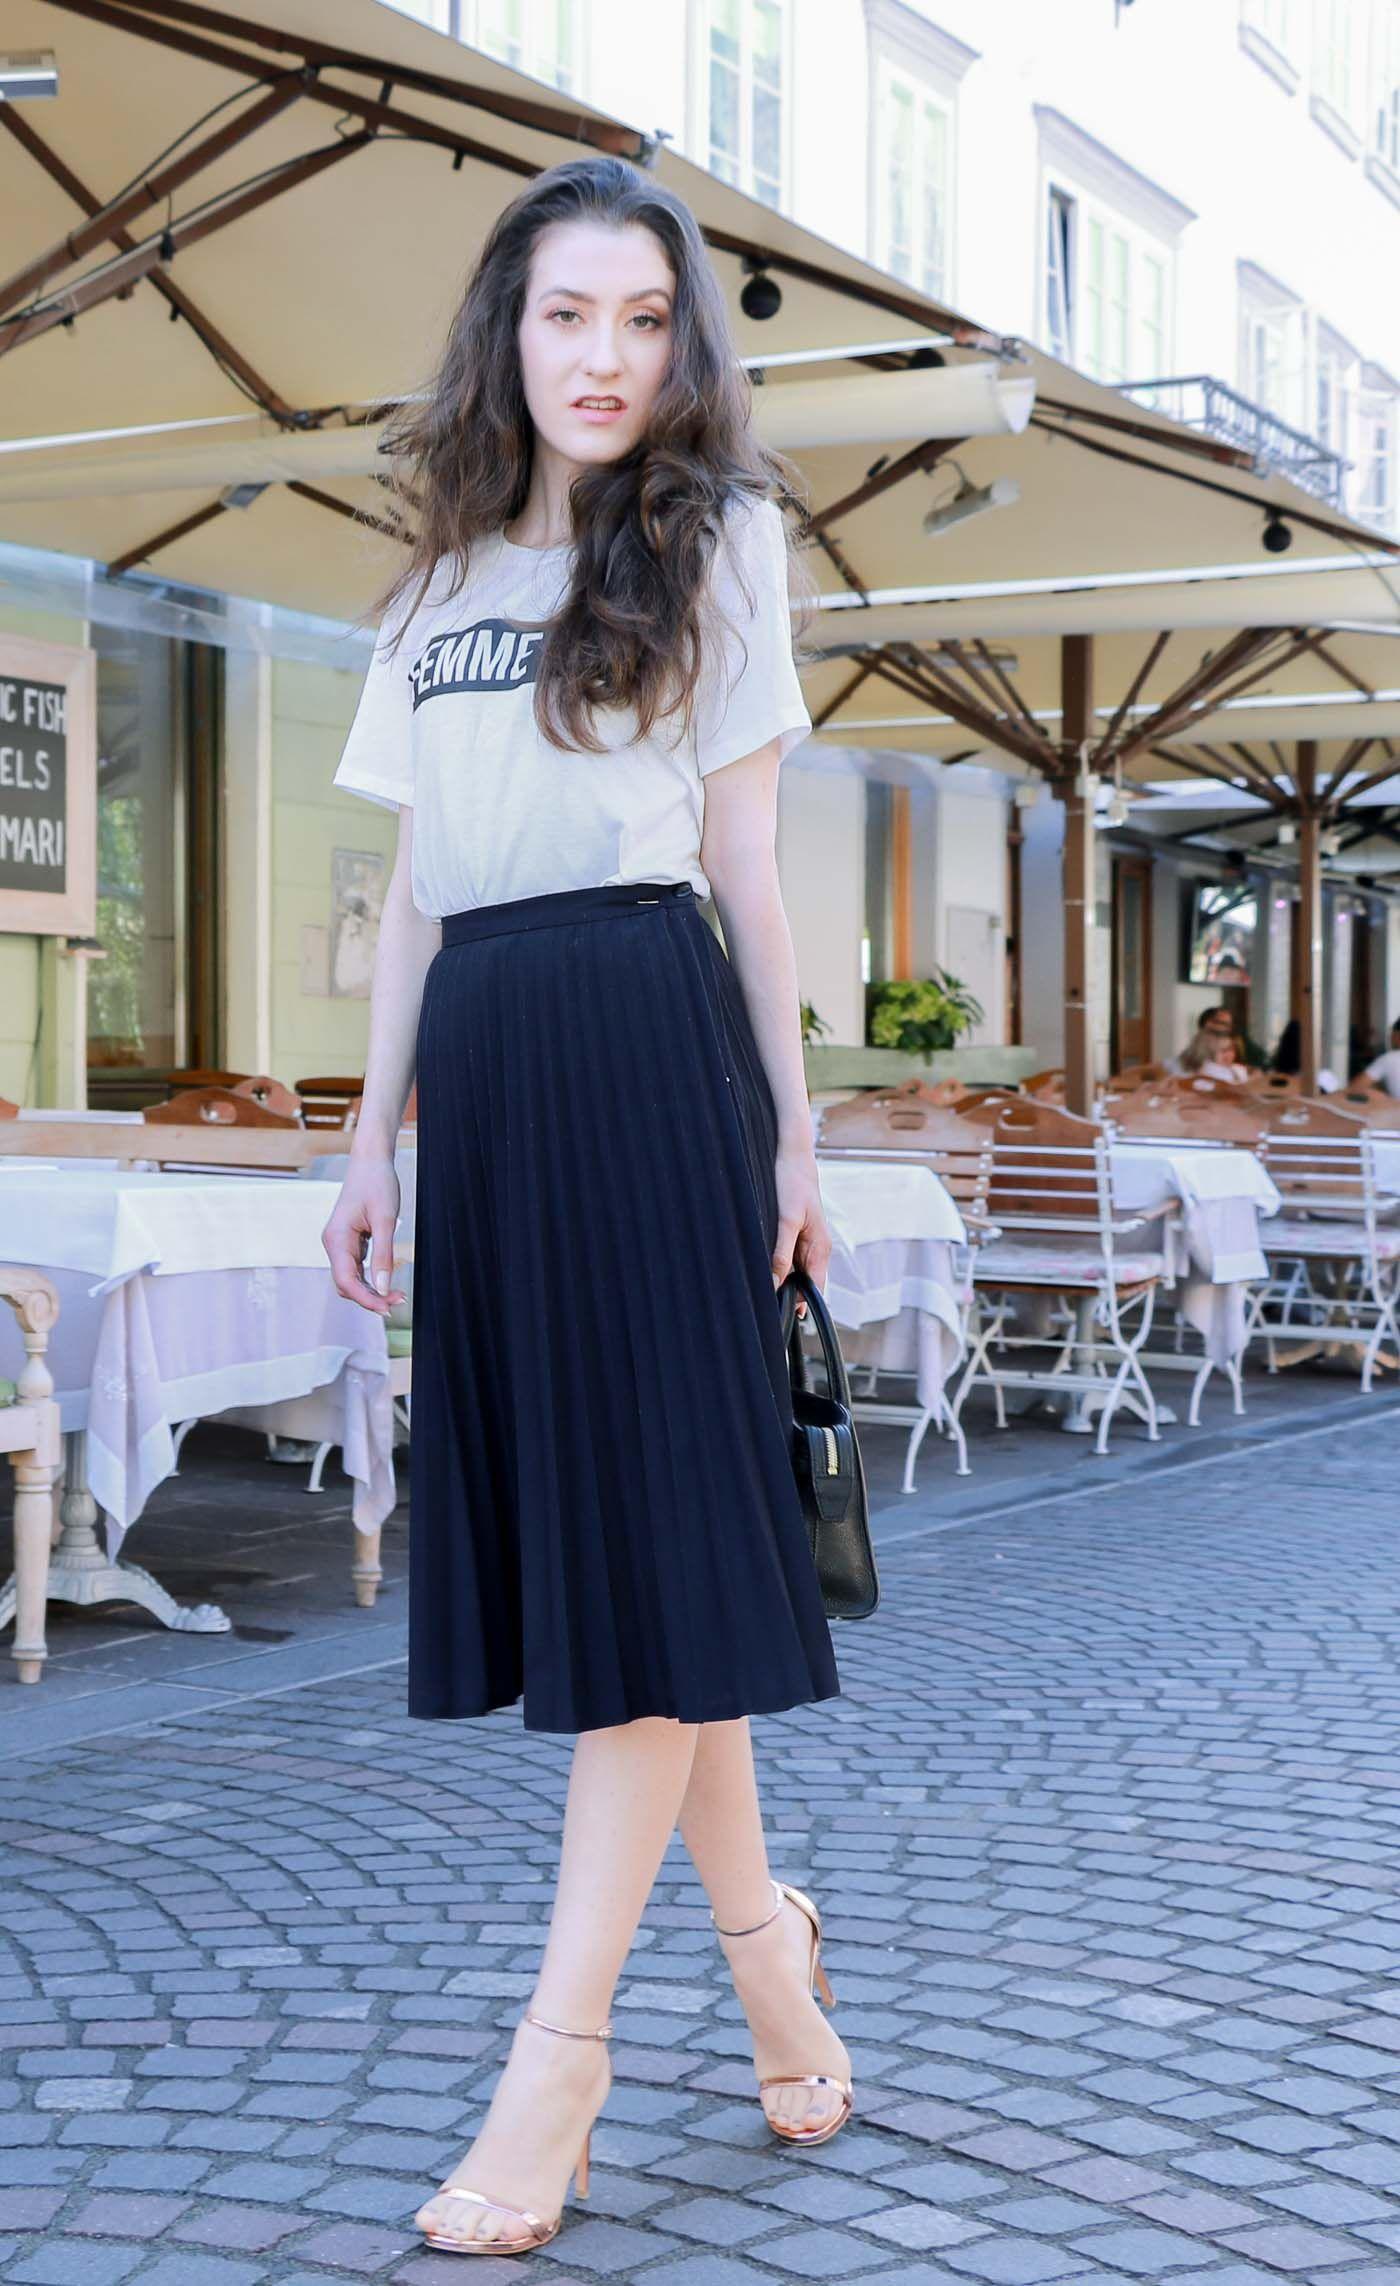 da1aed56c0 Fashion Blogger Veronika Lipar of Brunette from Wall Street wearing vintage midi  pleated skirt and slogan tee